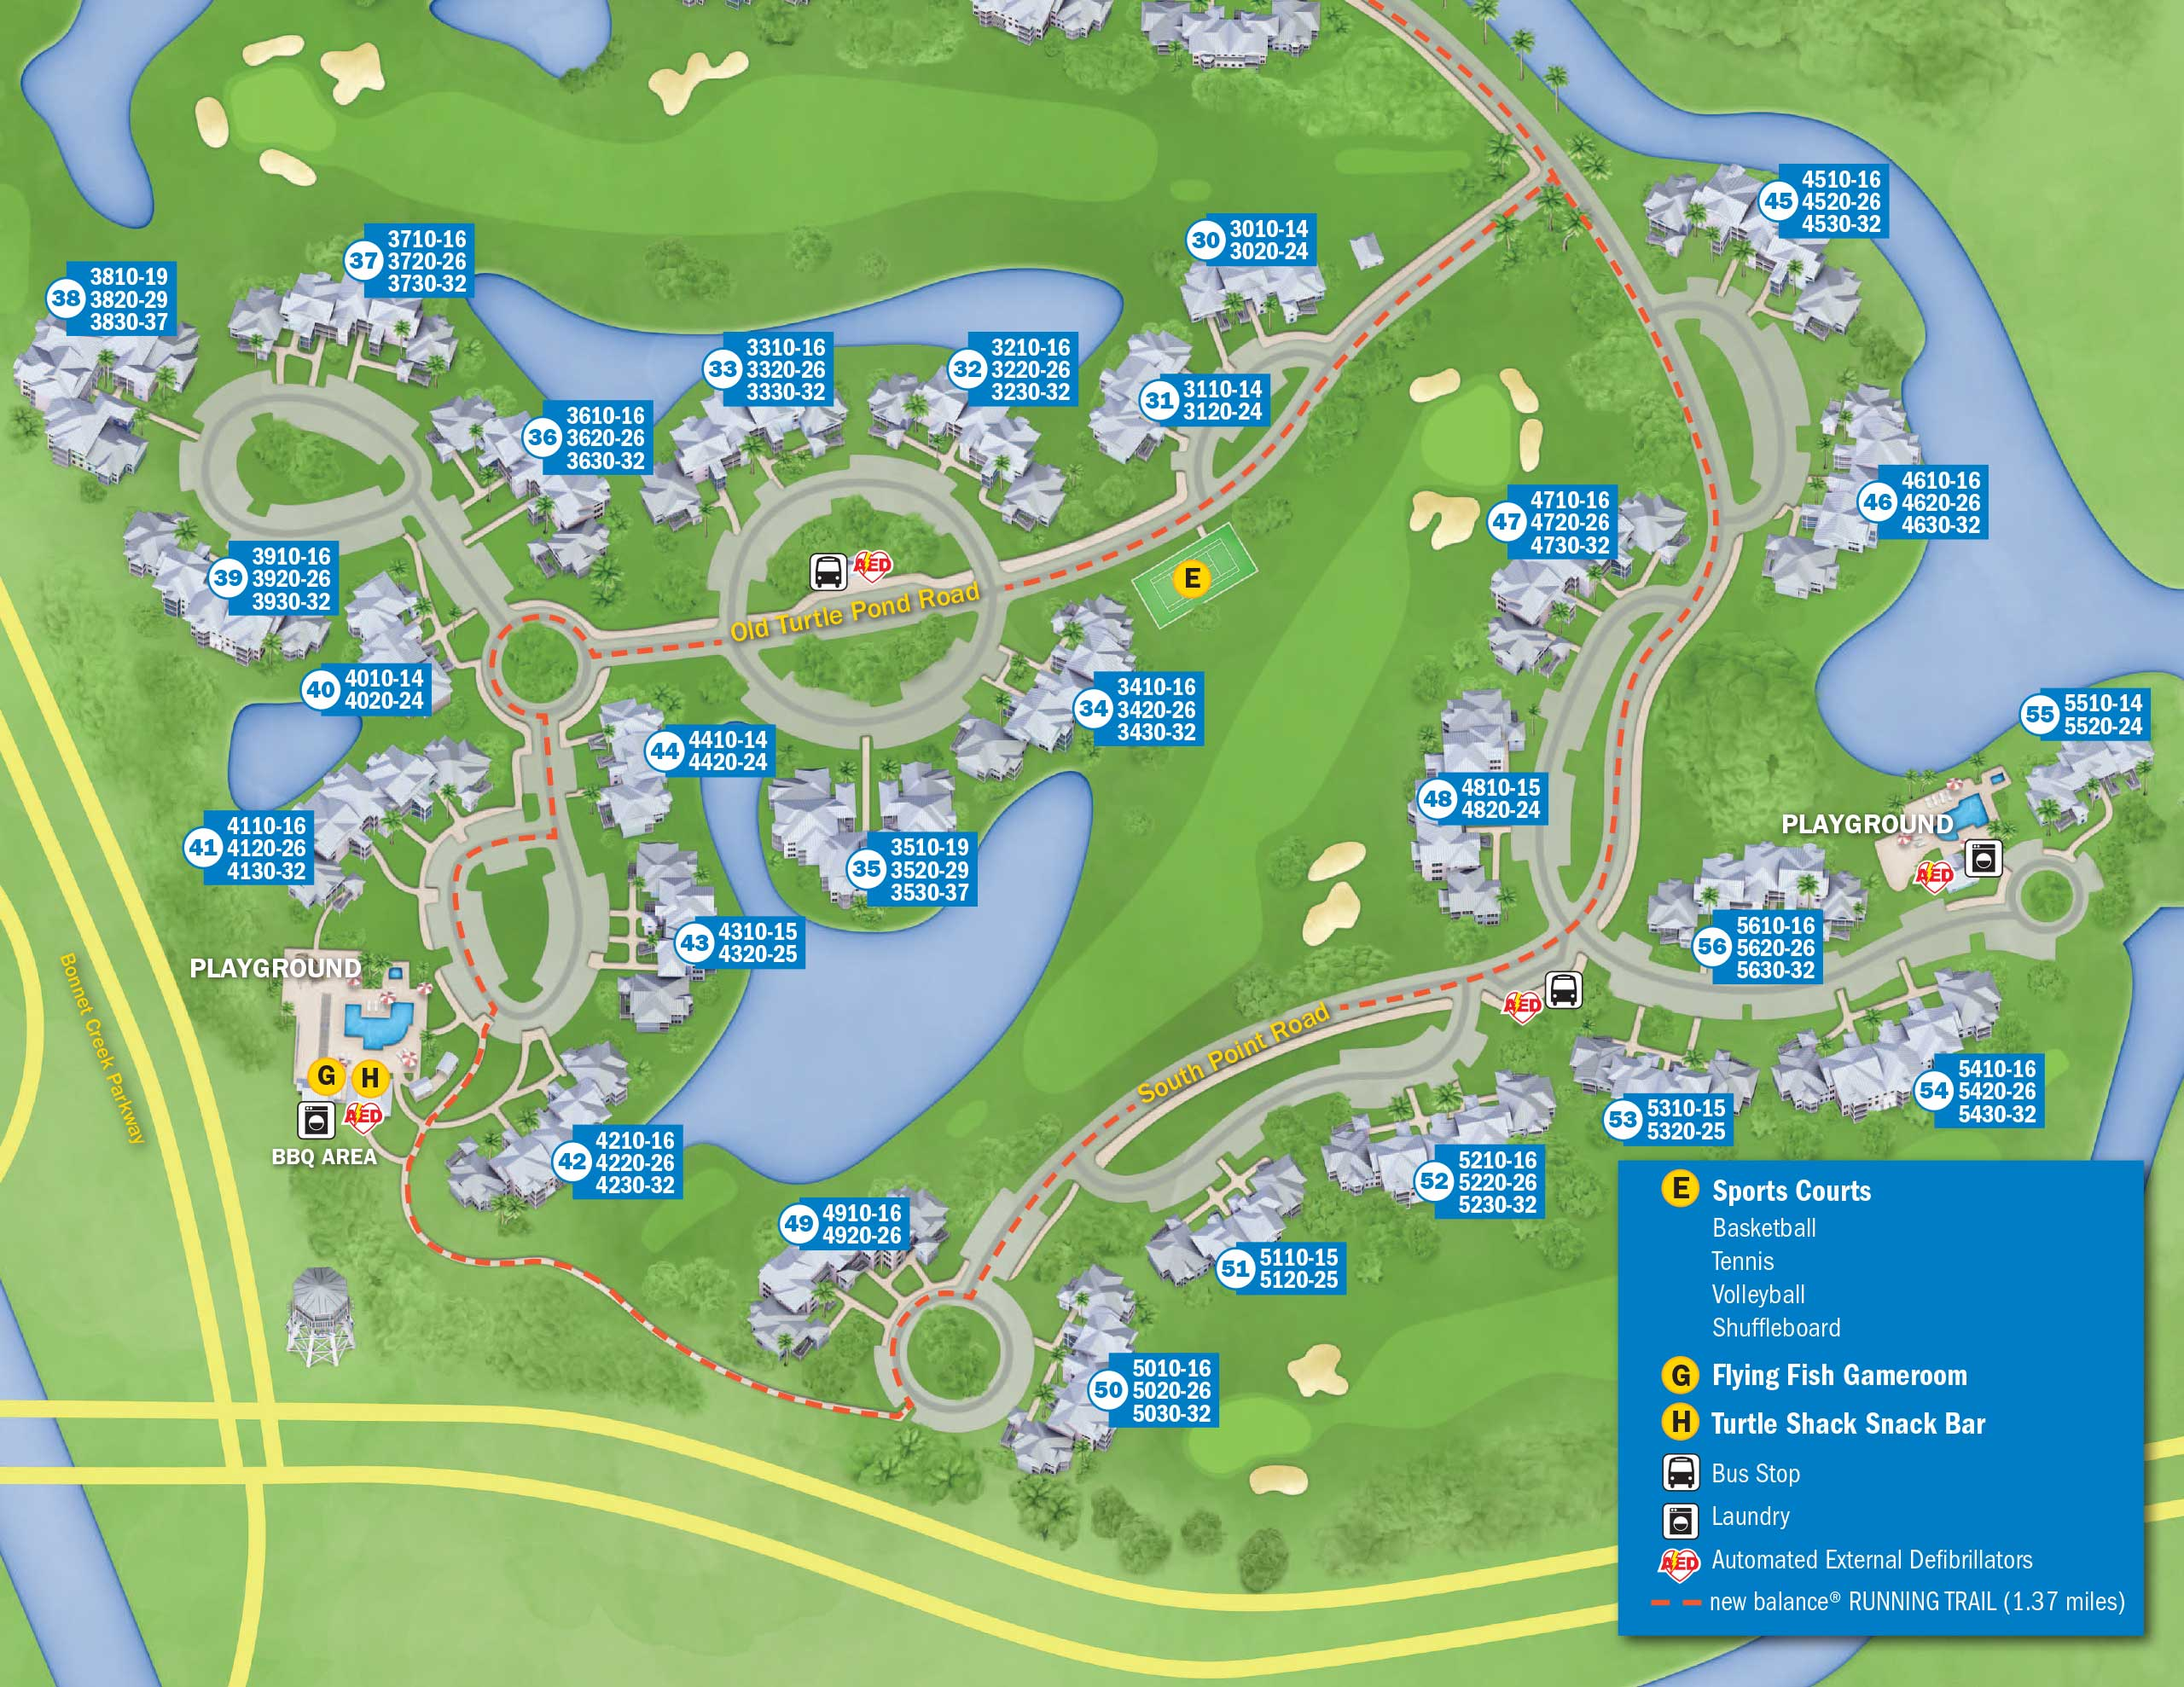 April 2017 Walt Disney World Resort Hotel Maps Photo 28 Of 33: Disney World Hotels Map At Slyspyder.com